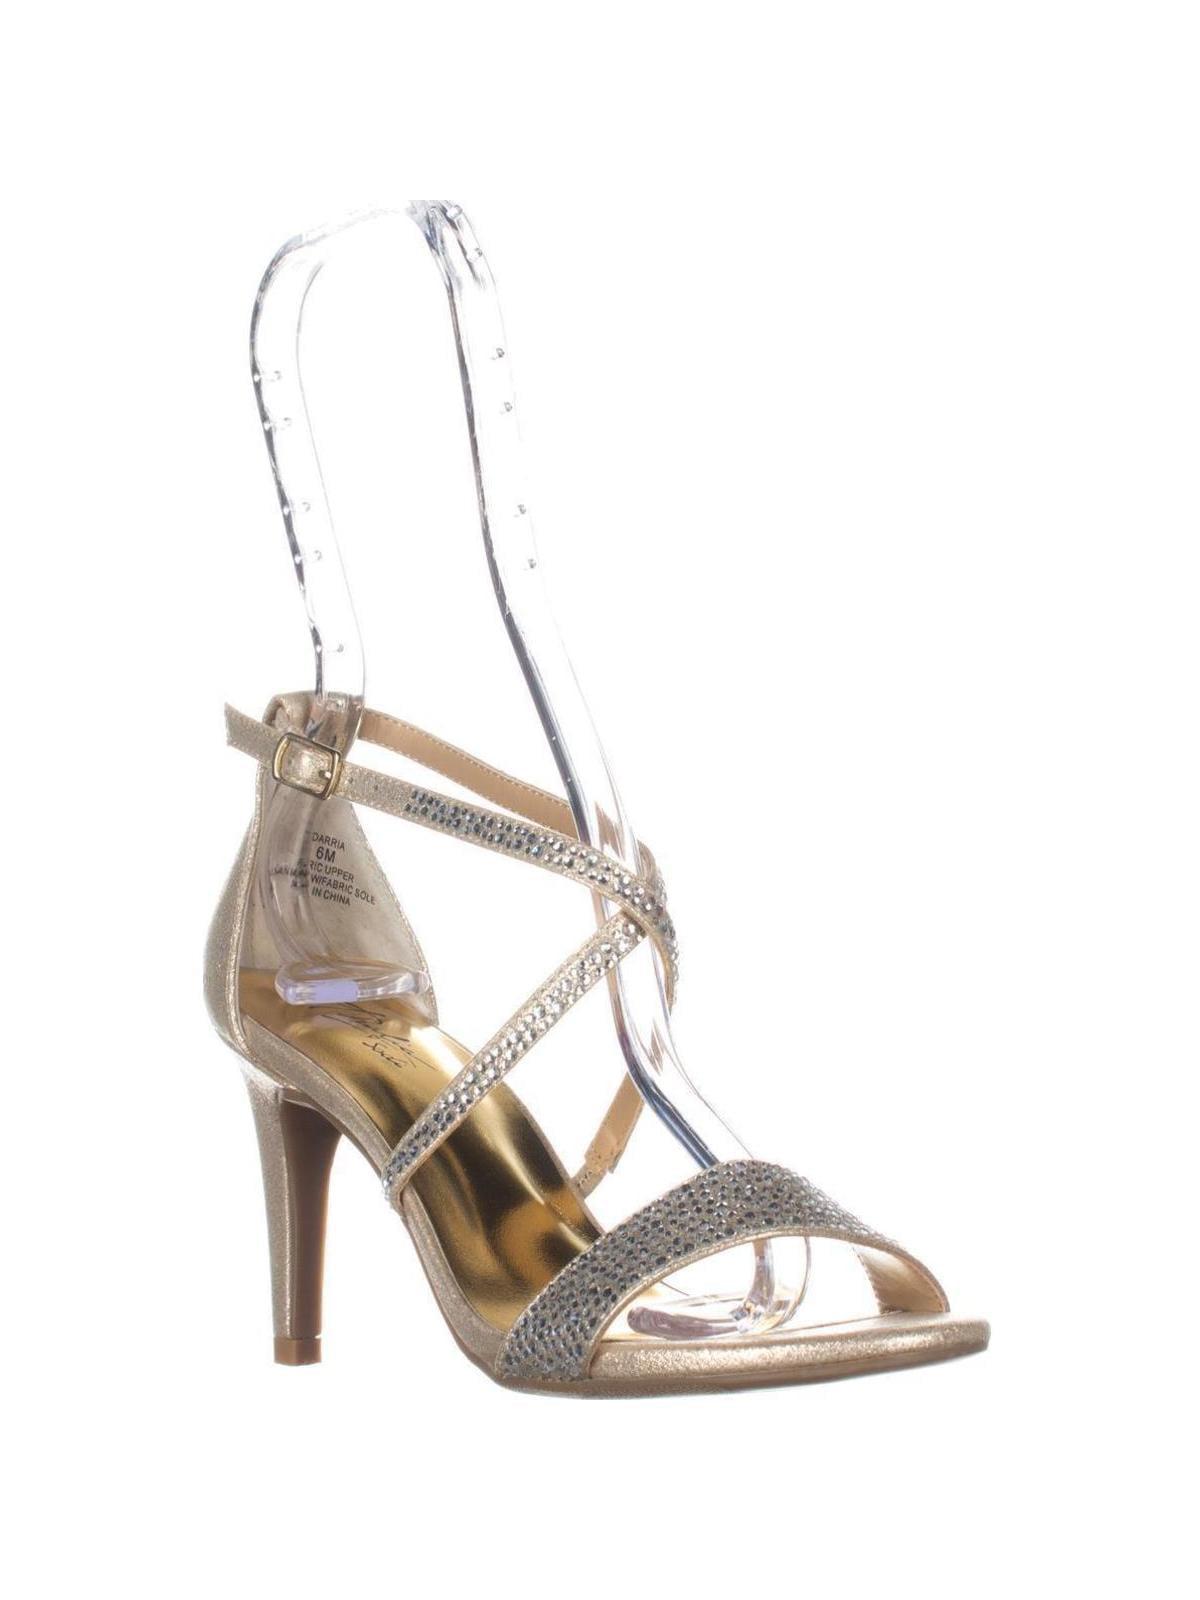 TS35 Darria Cross Strap Evening Sandals